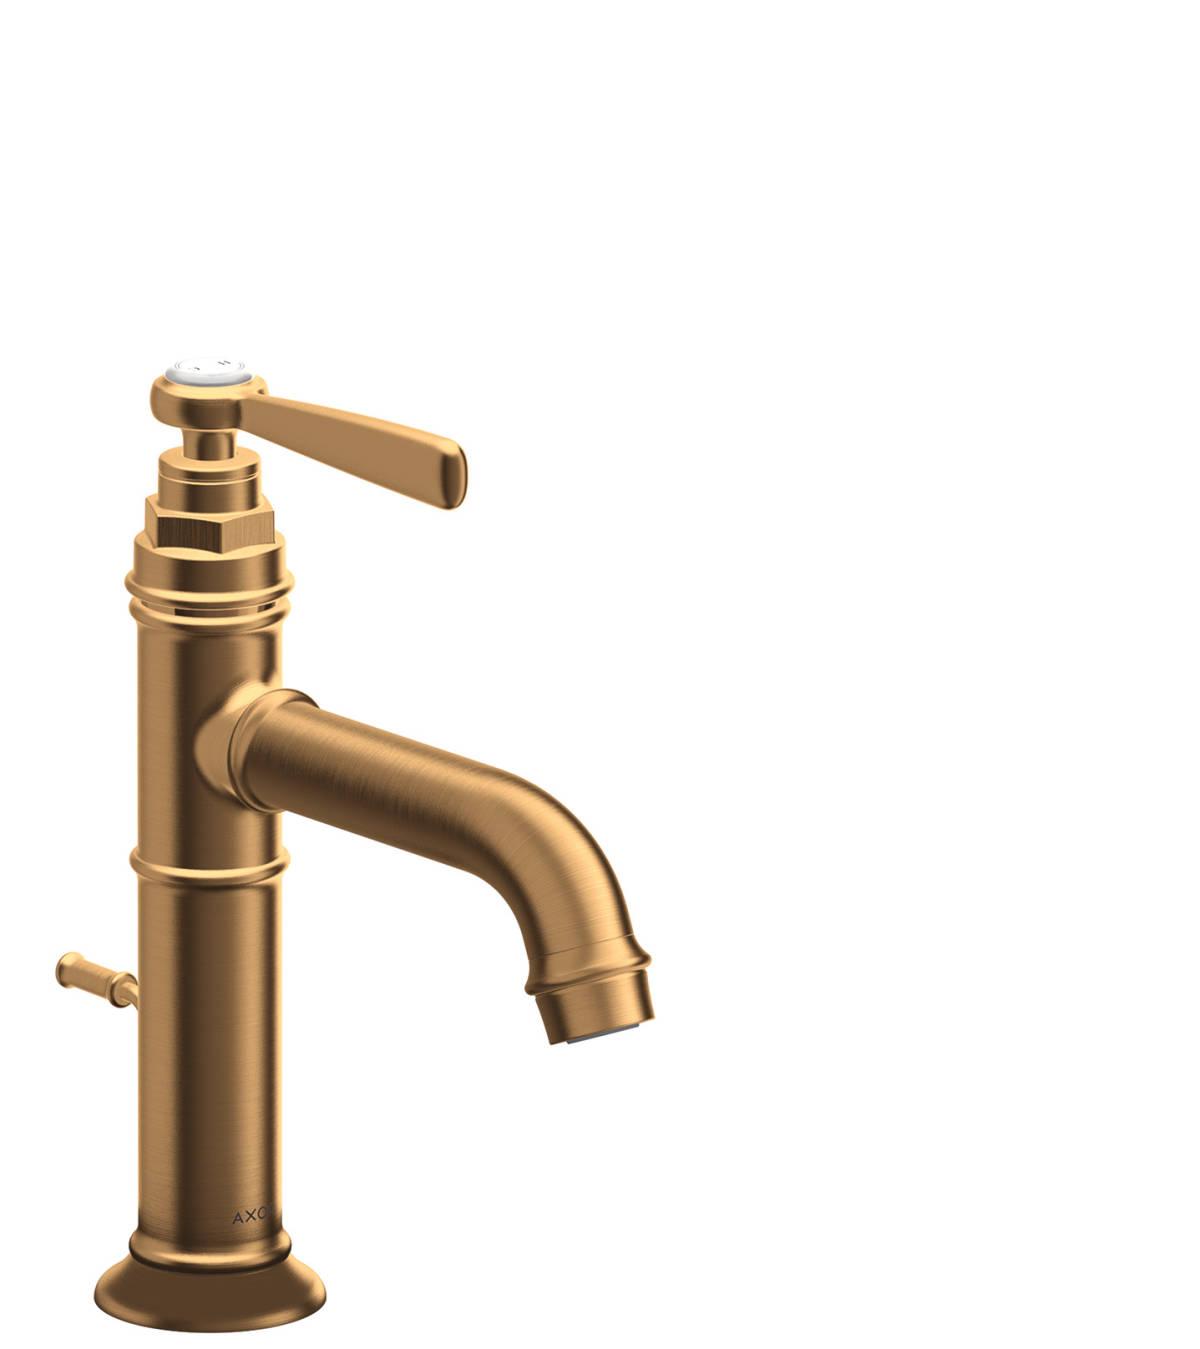 Single lever basin mixer 100 with pop-up waste set, Brushed Gold Optic, 16515250